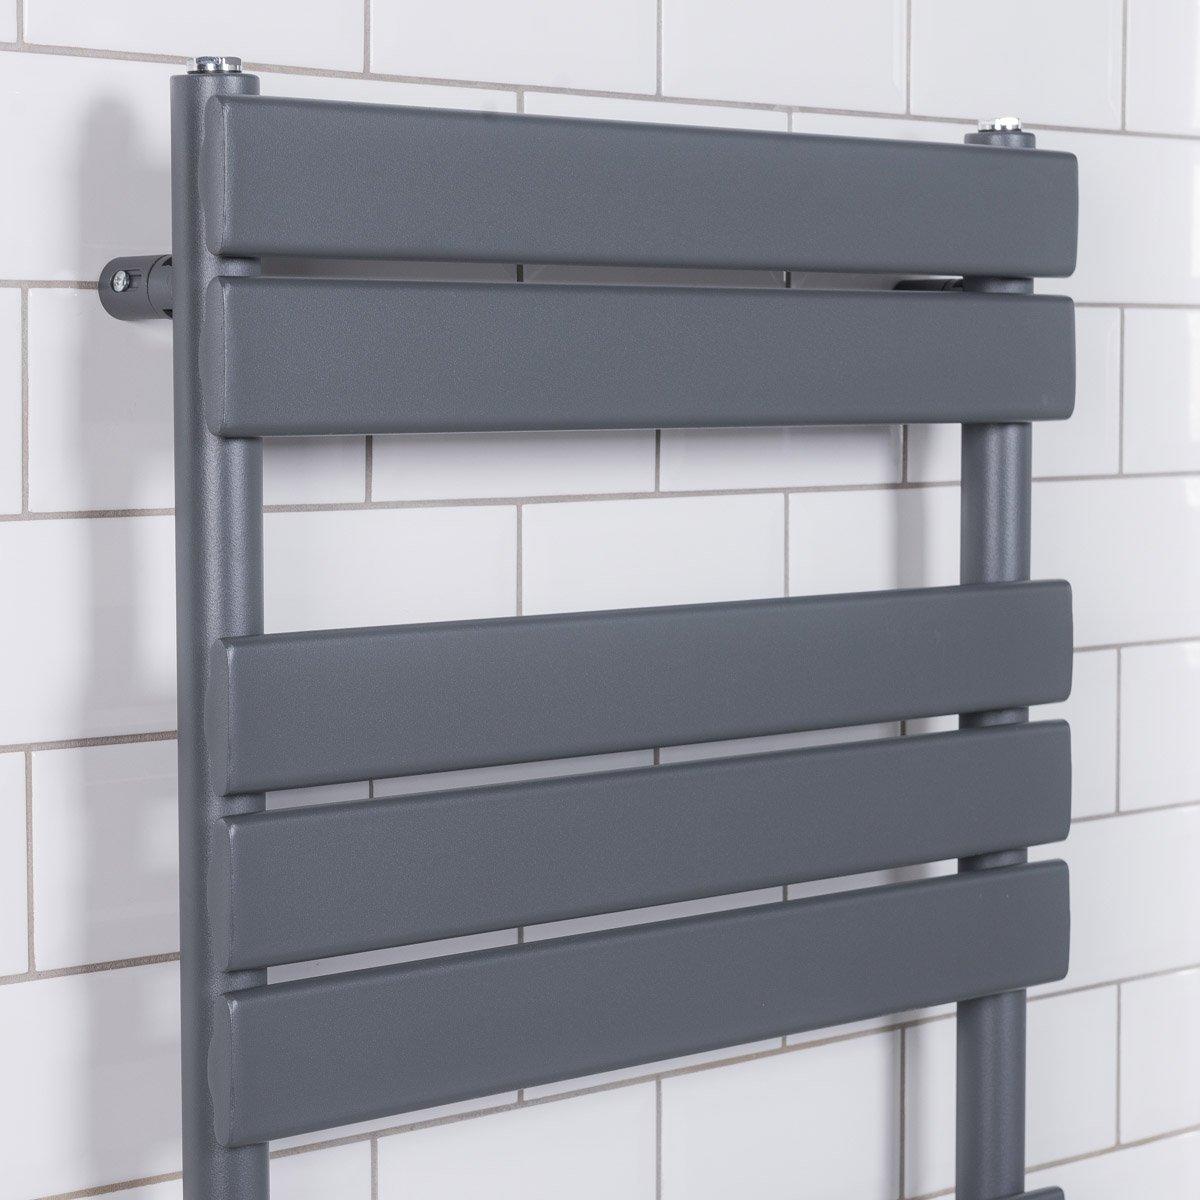 Designer-Flat-Panel-Heated-Bathroom-Towel-Rail-Radiator-Chrome-White-Grey